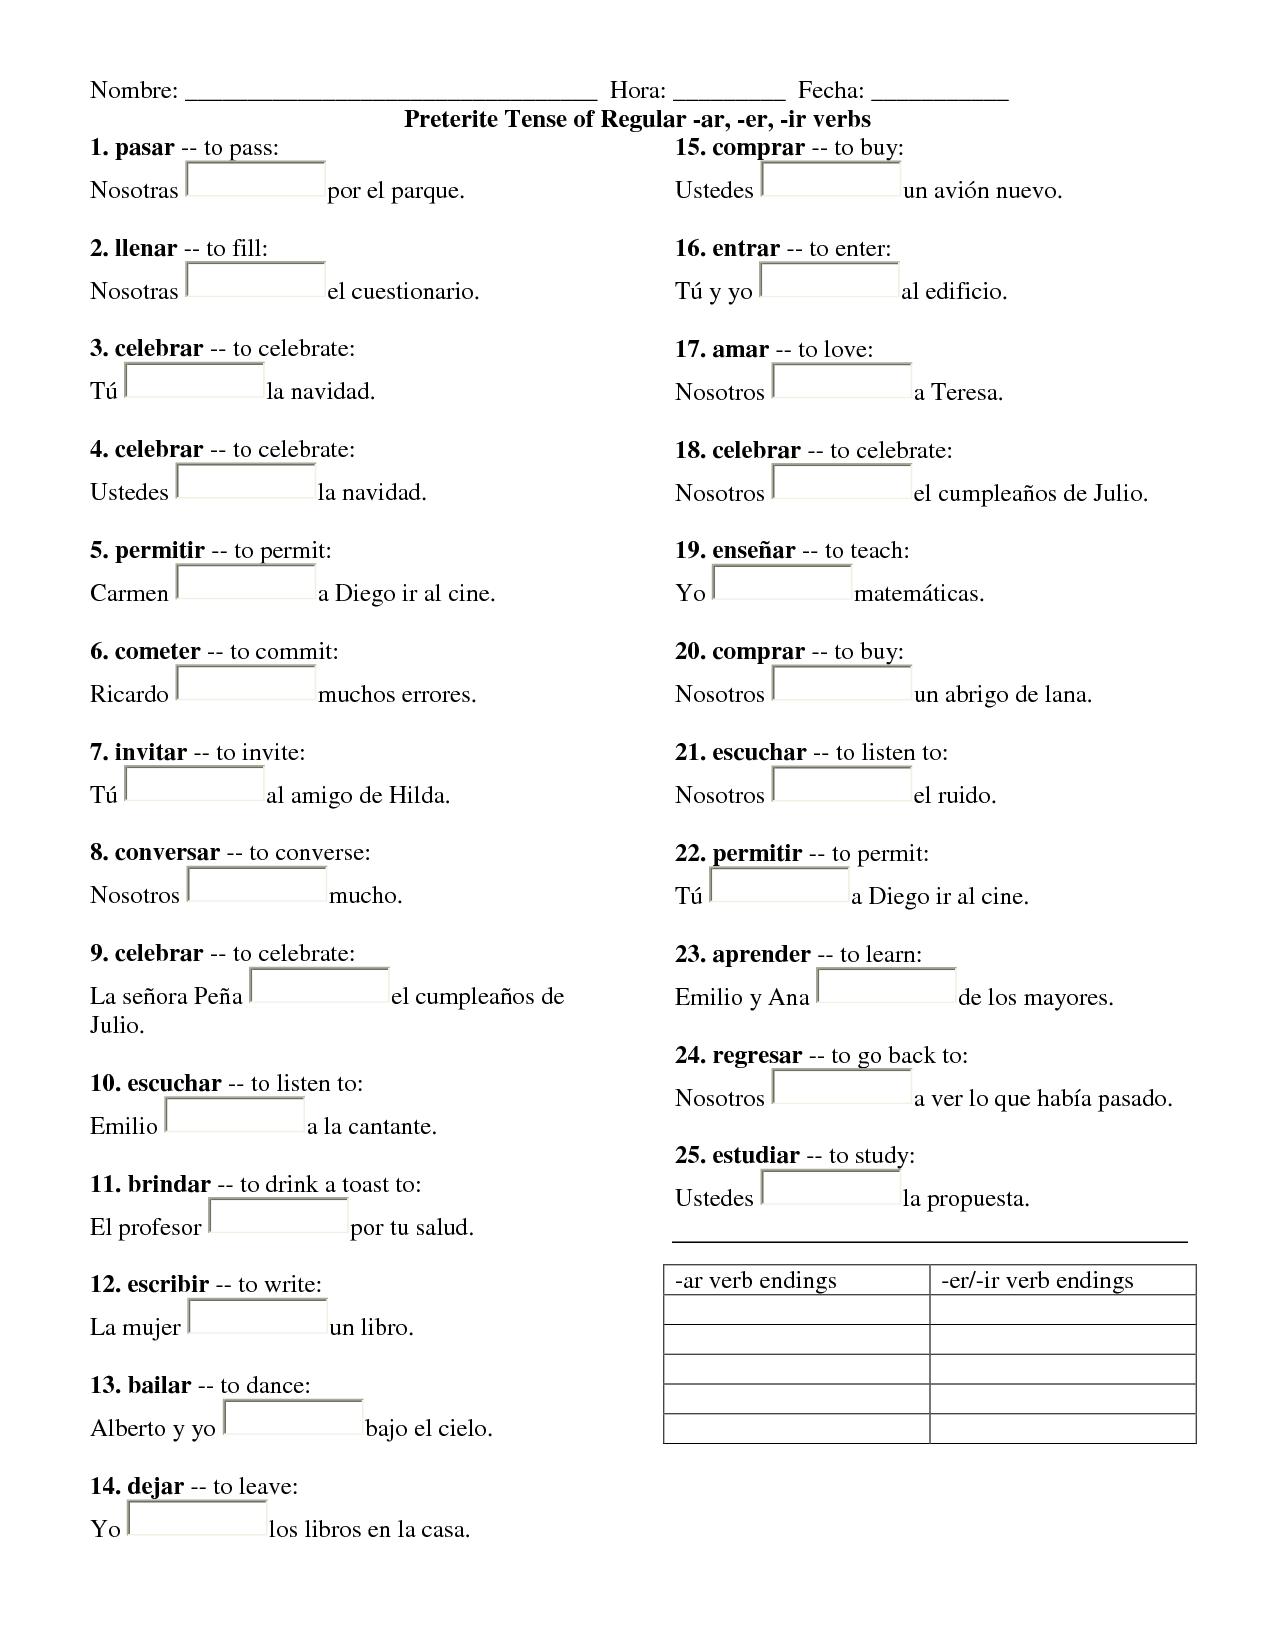 Worksheet Preterite Tense